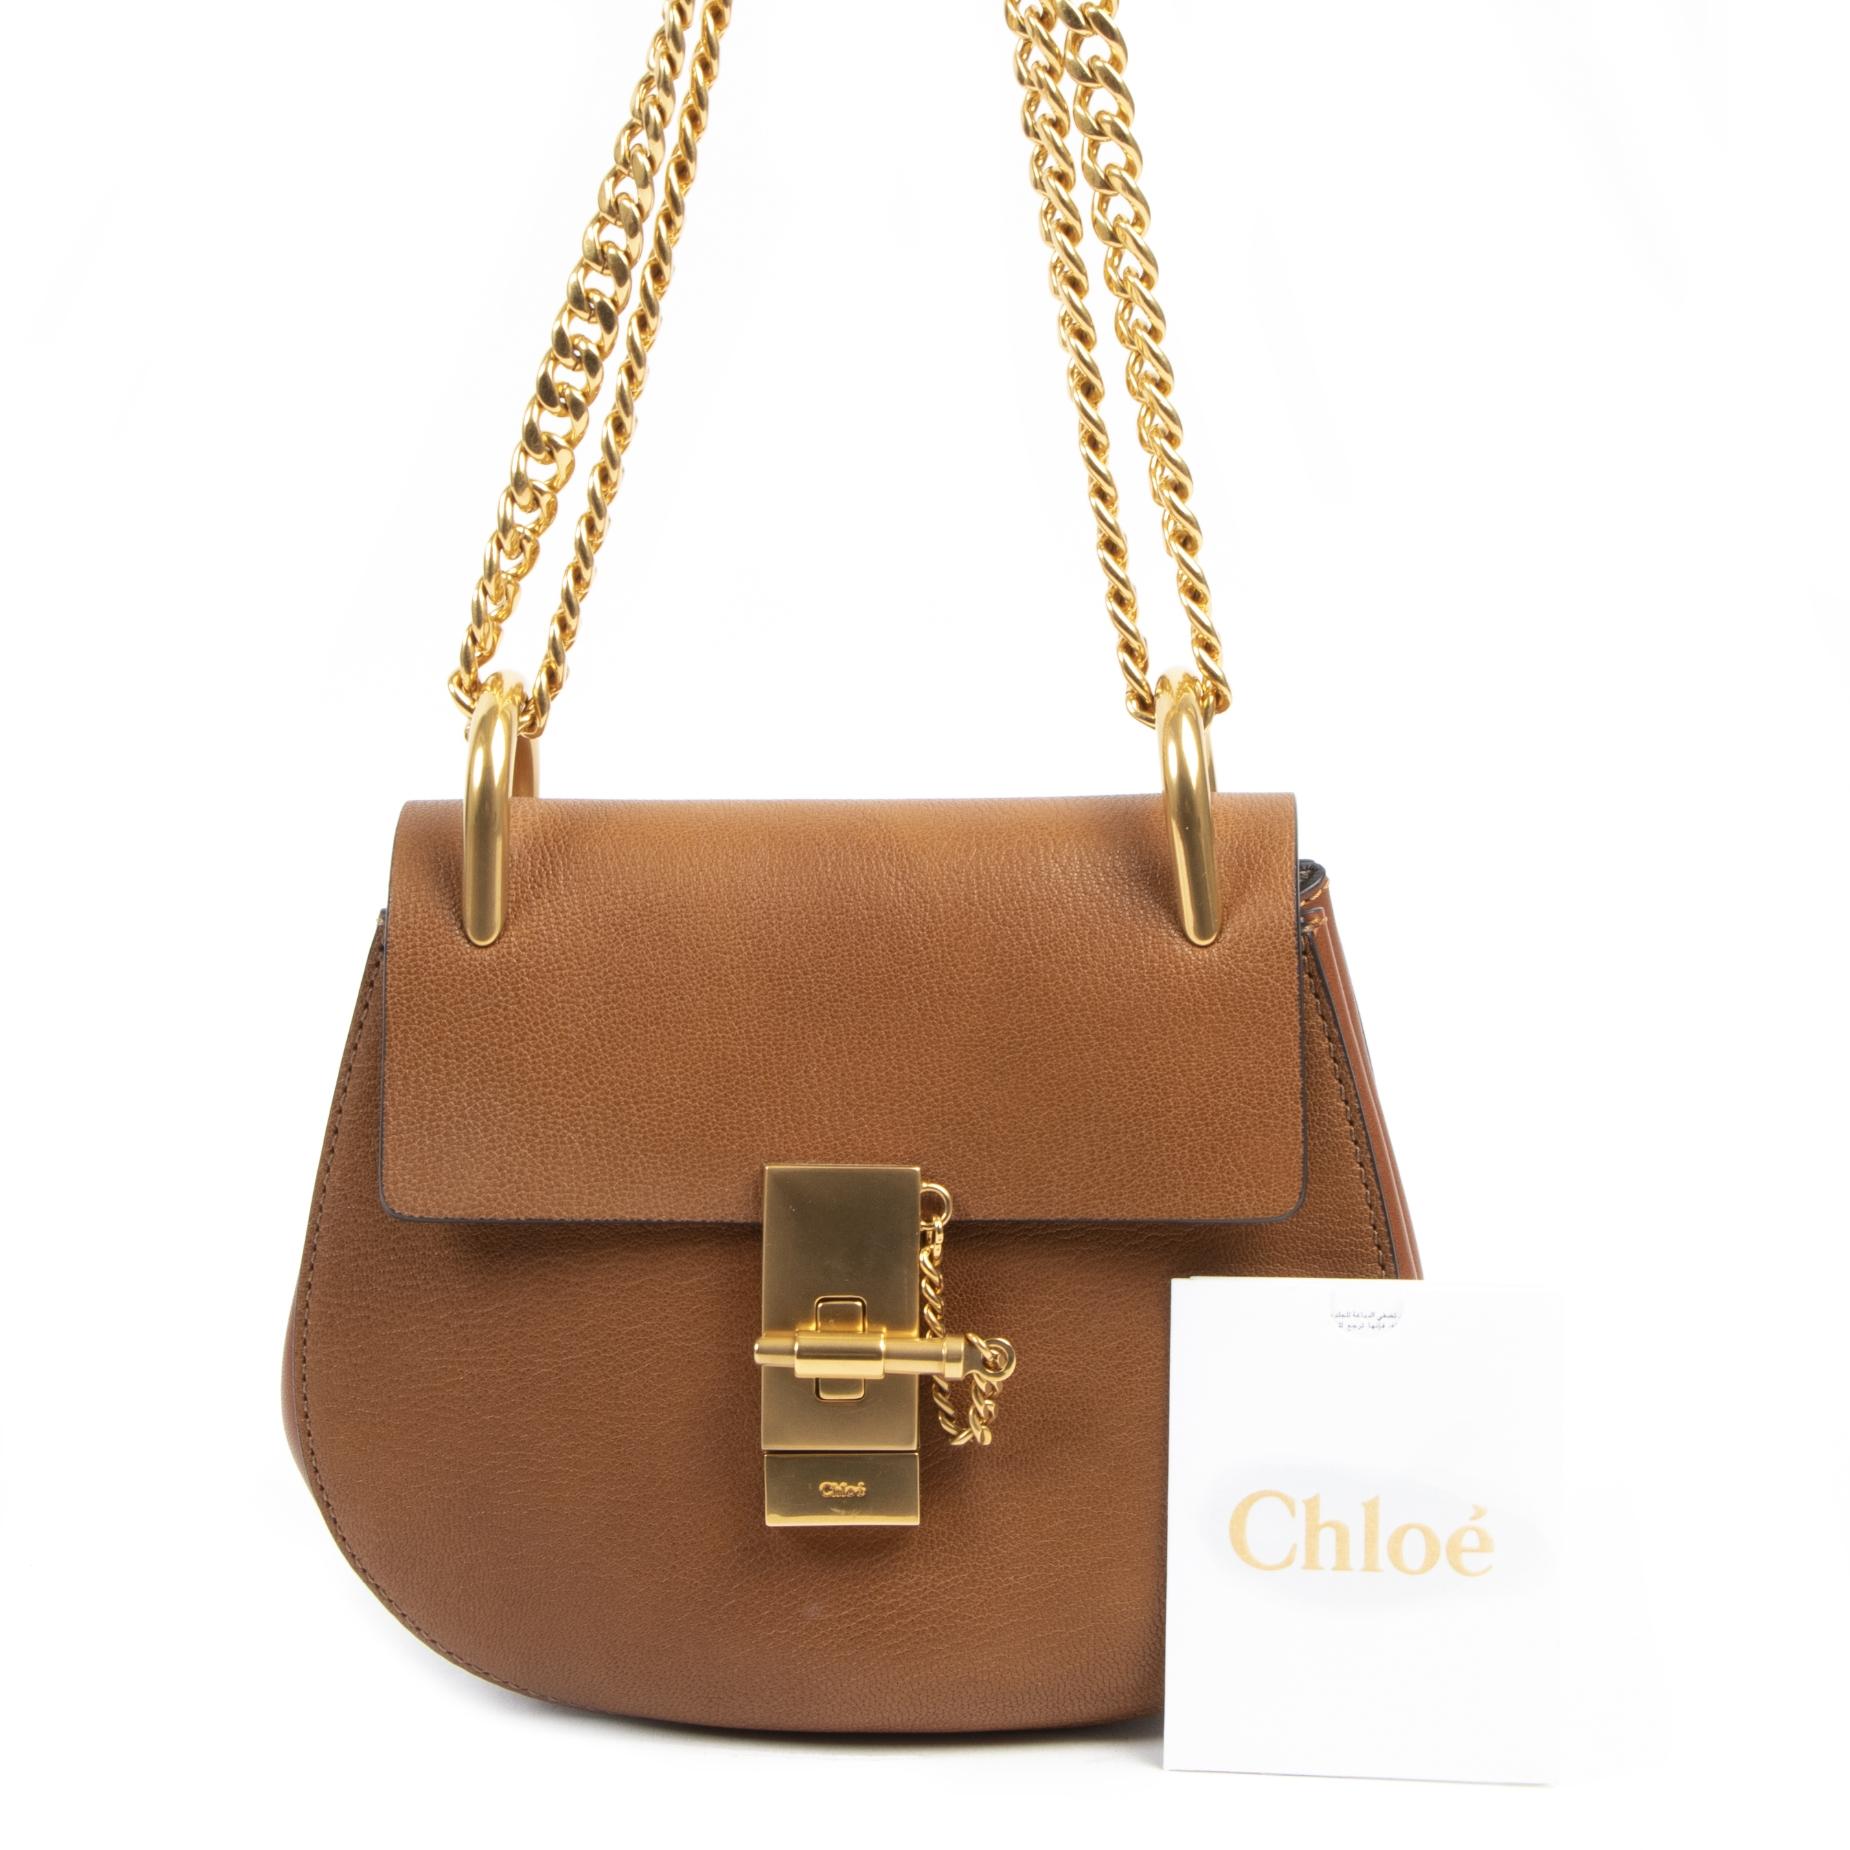 Chloé Brown Small Drew Bag GHW